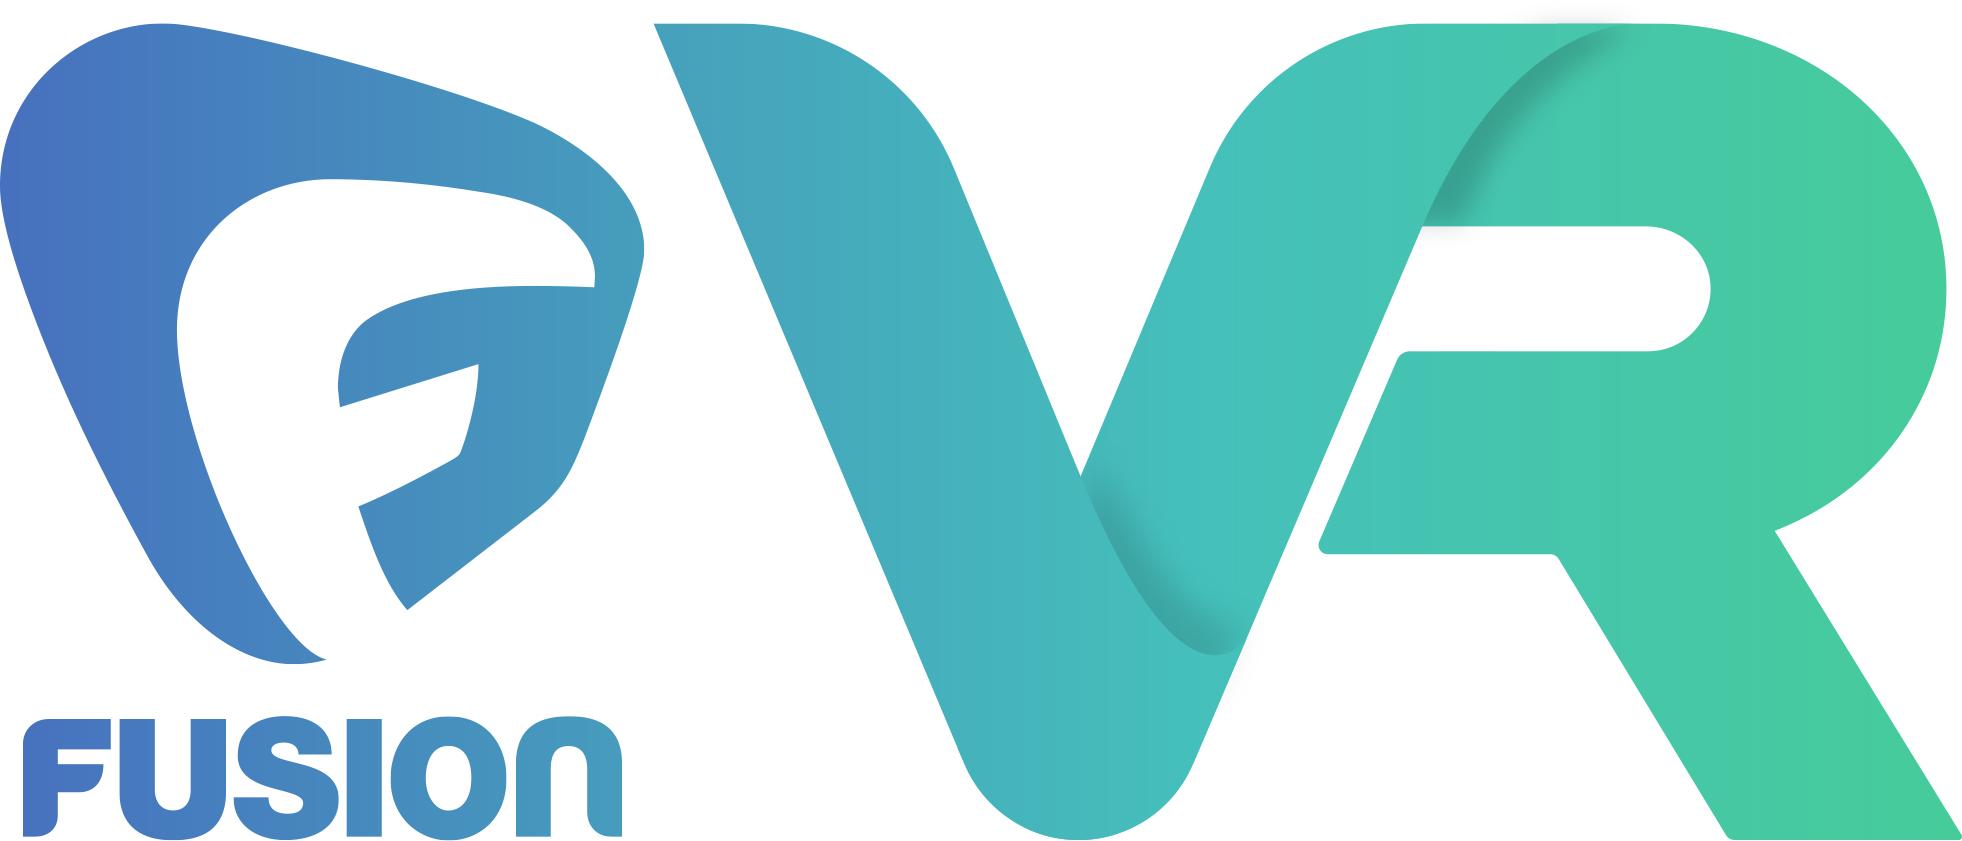 FusionVR Logo